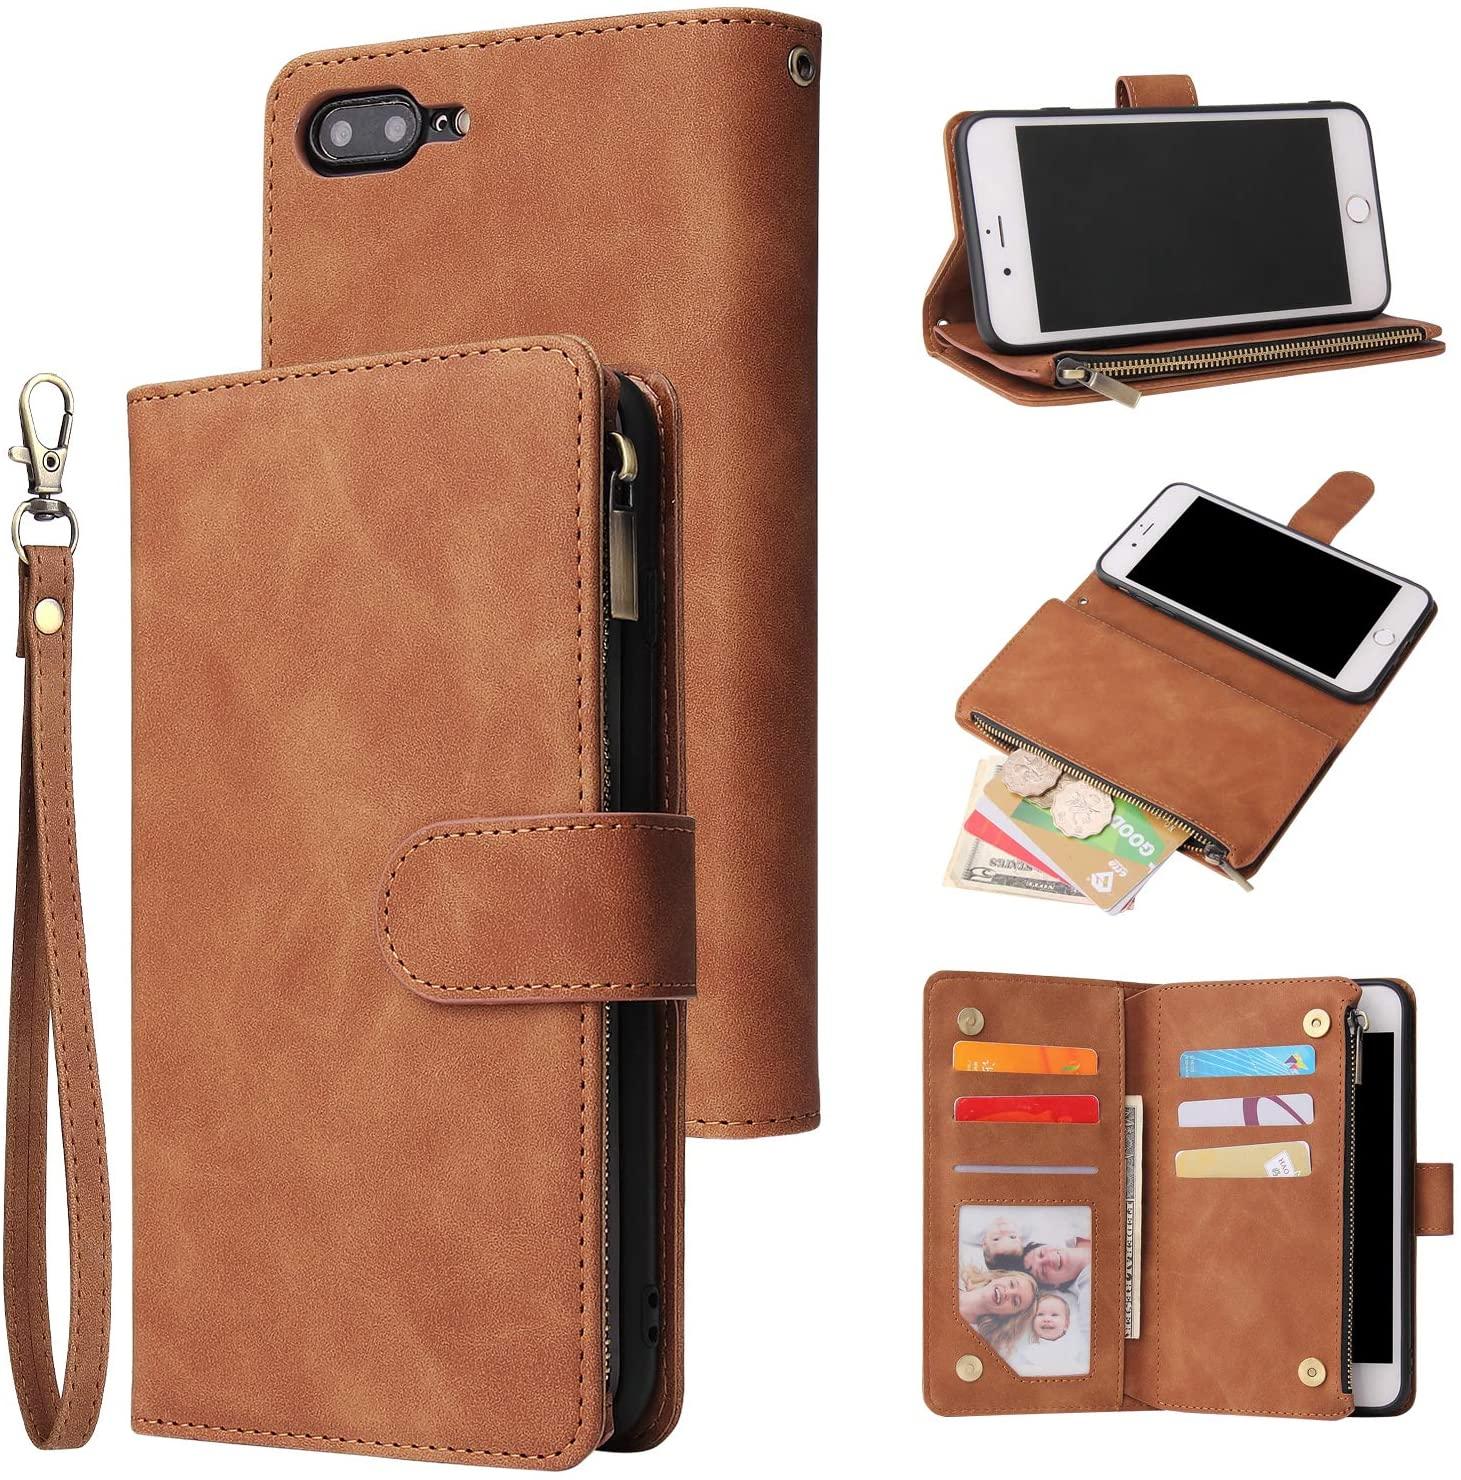 Ueebai Wallet Case for iPhone